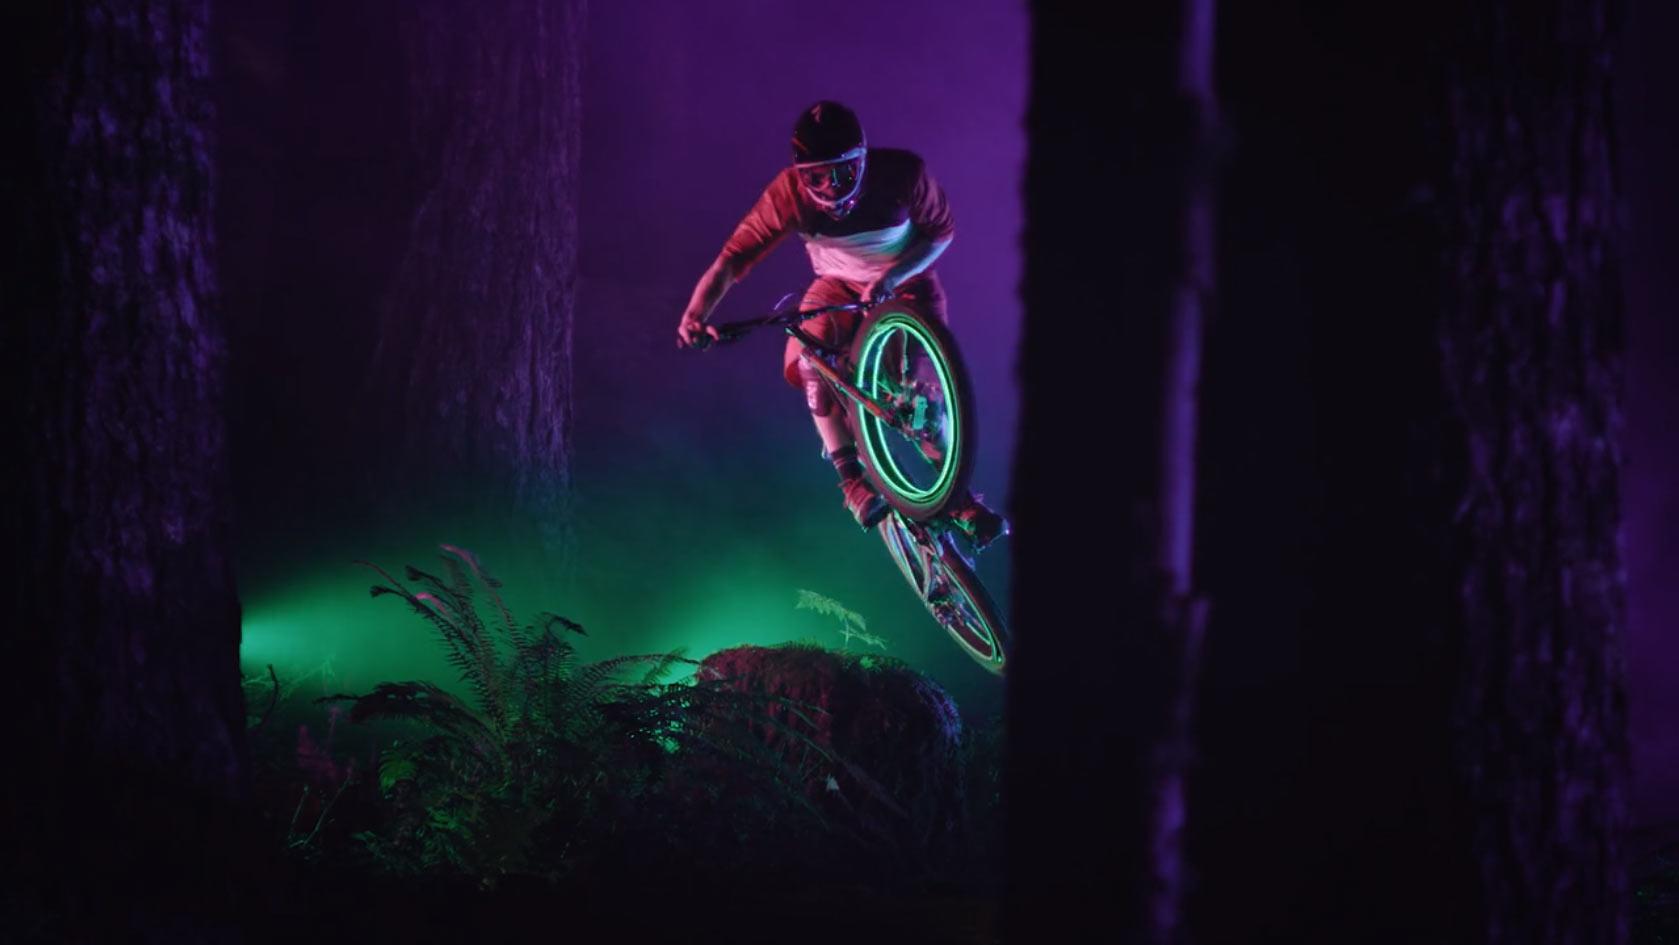 Sweetgrass Productions Darklight Bike Film Screenshot